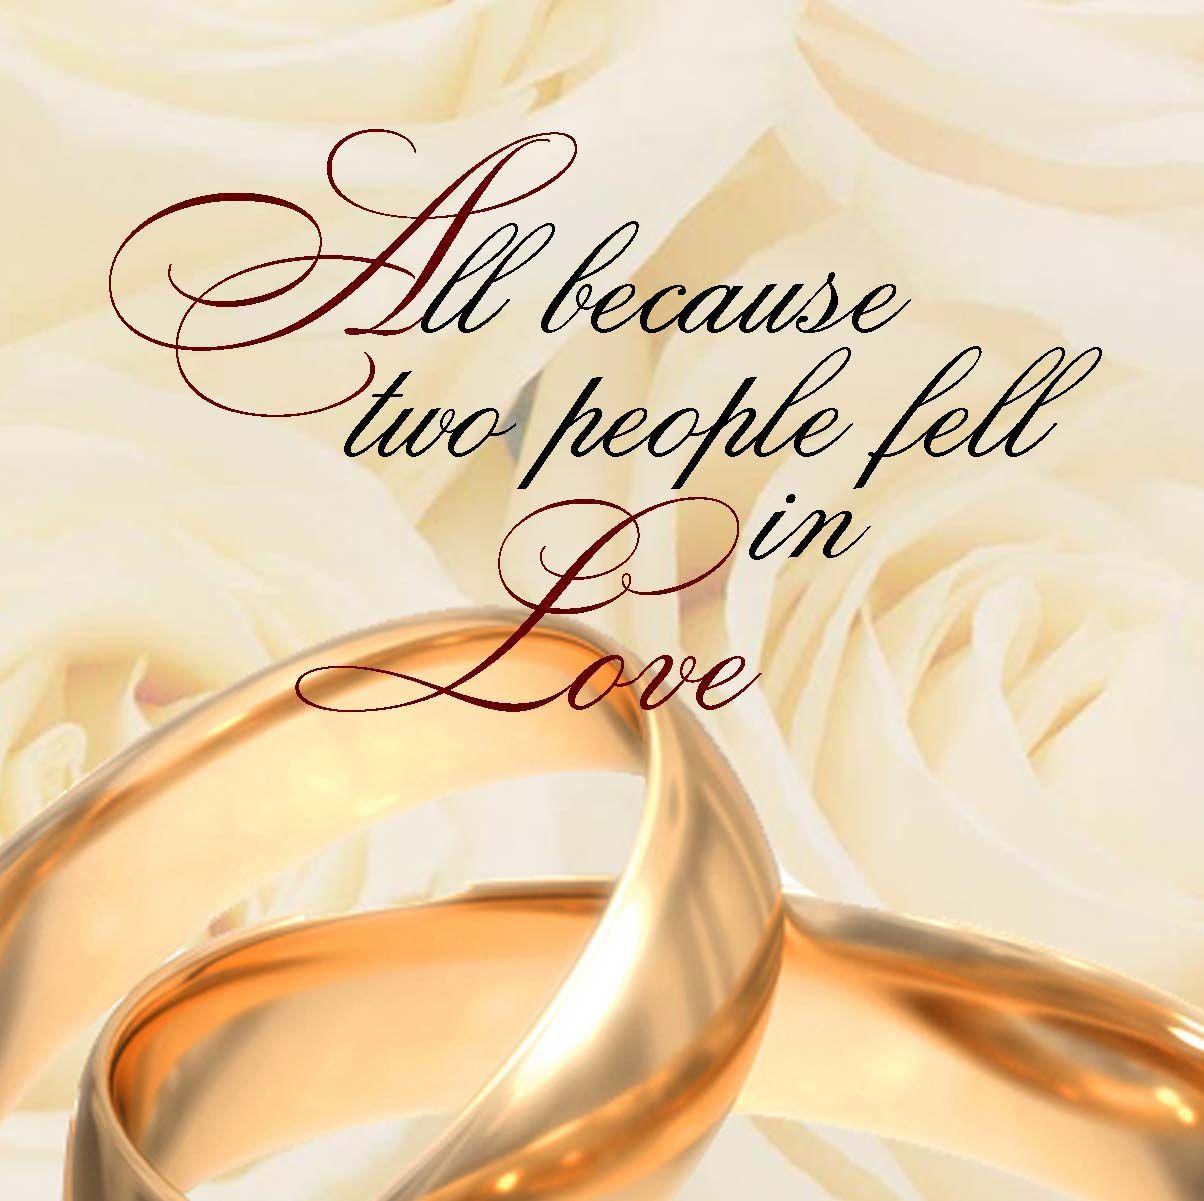 IN LOVE 2 Engagement rings, Wedding rings, Engagement